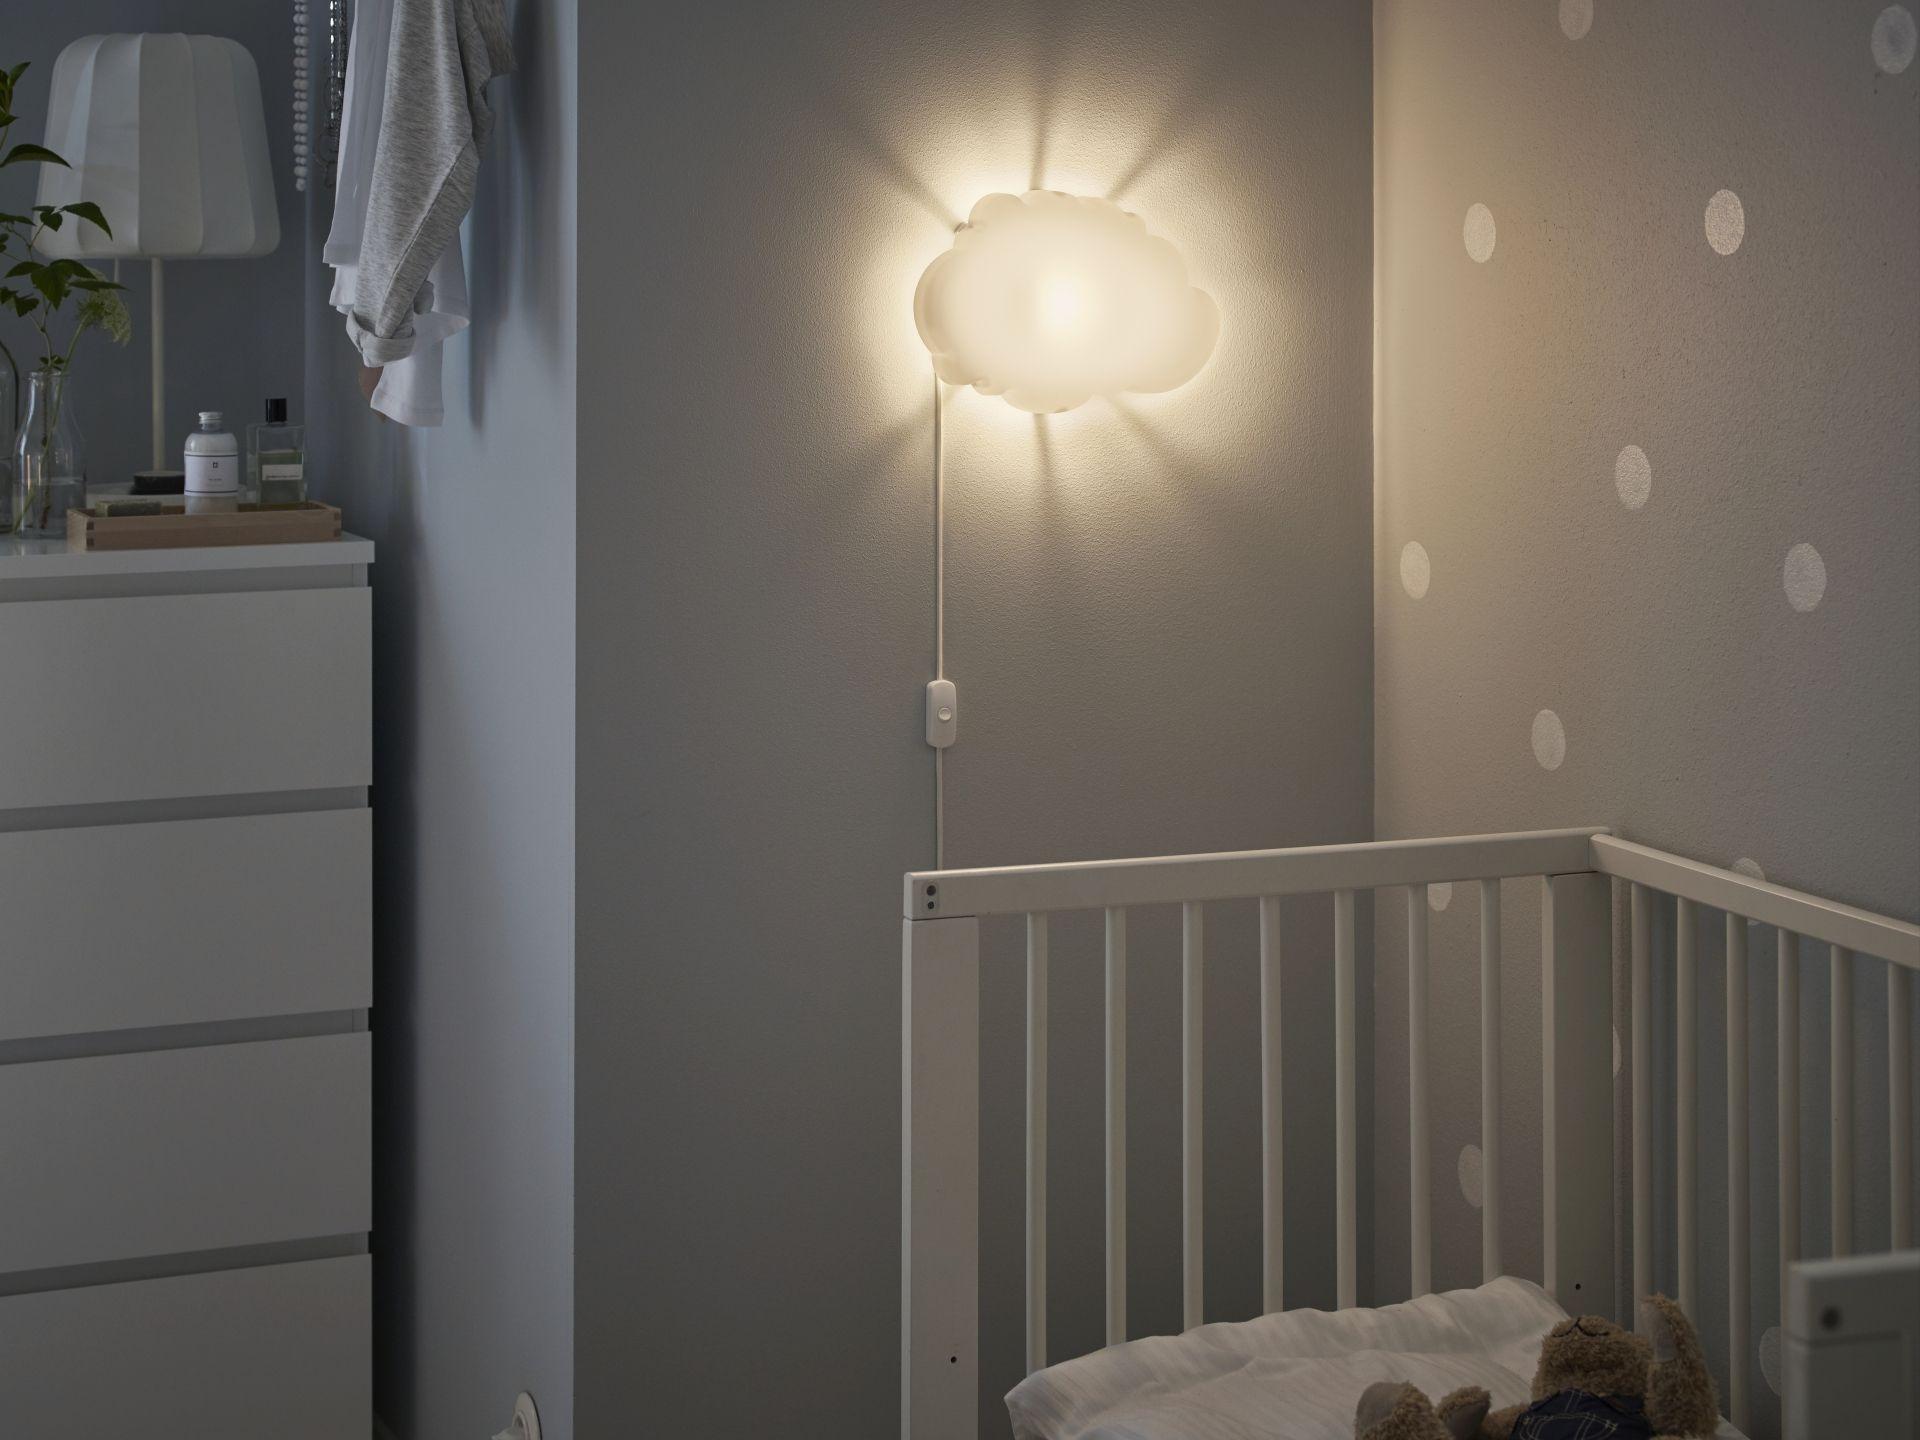 Babykamer Inrichten Ideeen : DrÖmsyn wandlamp ikea ikeanl ikeanederland 2wmn inspiratie